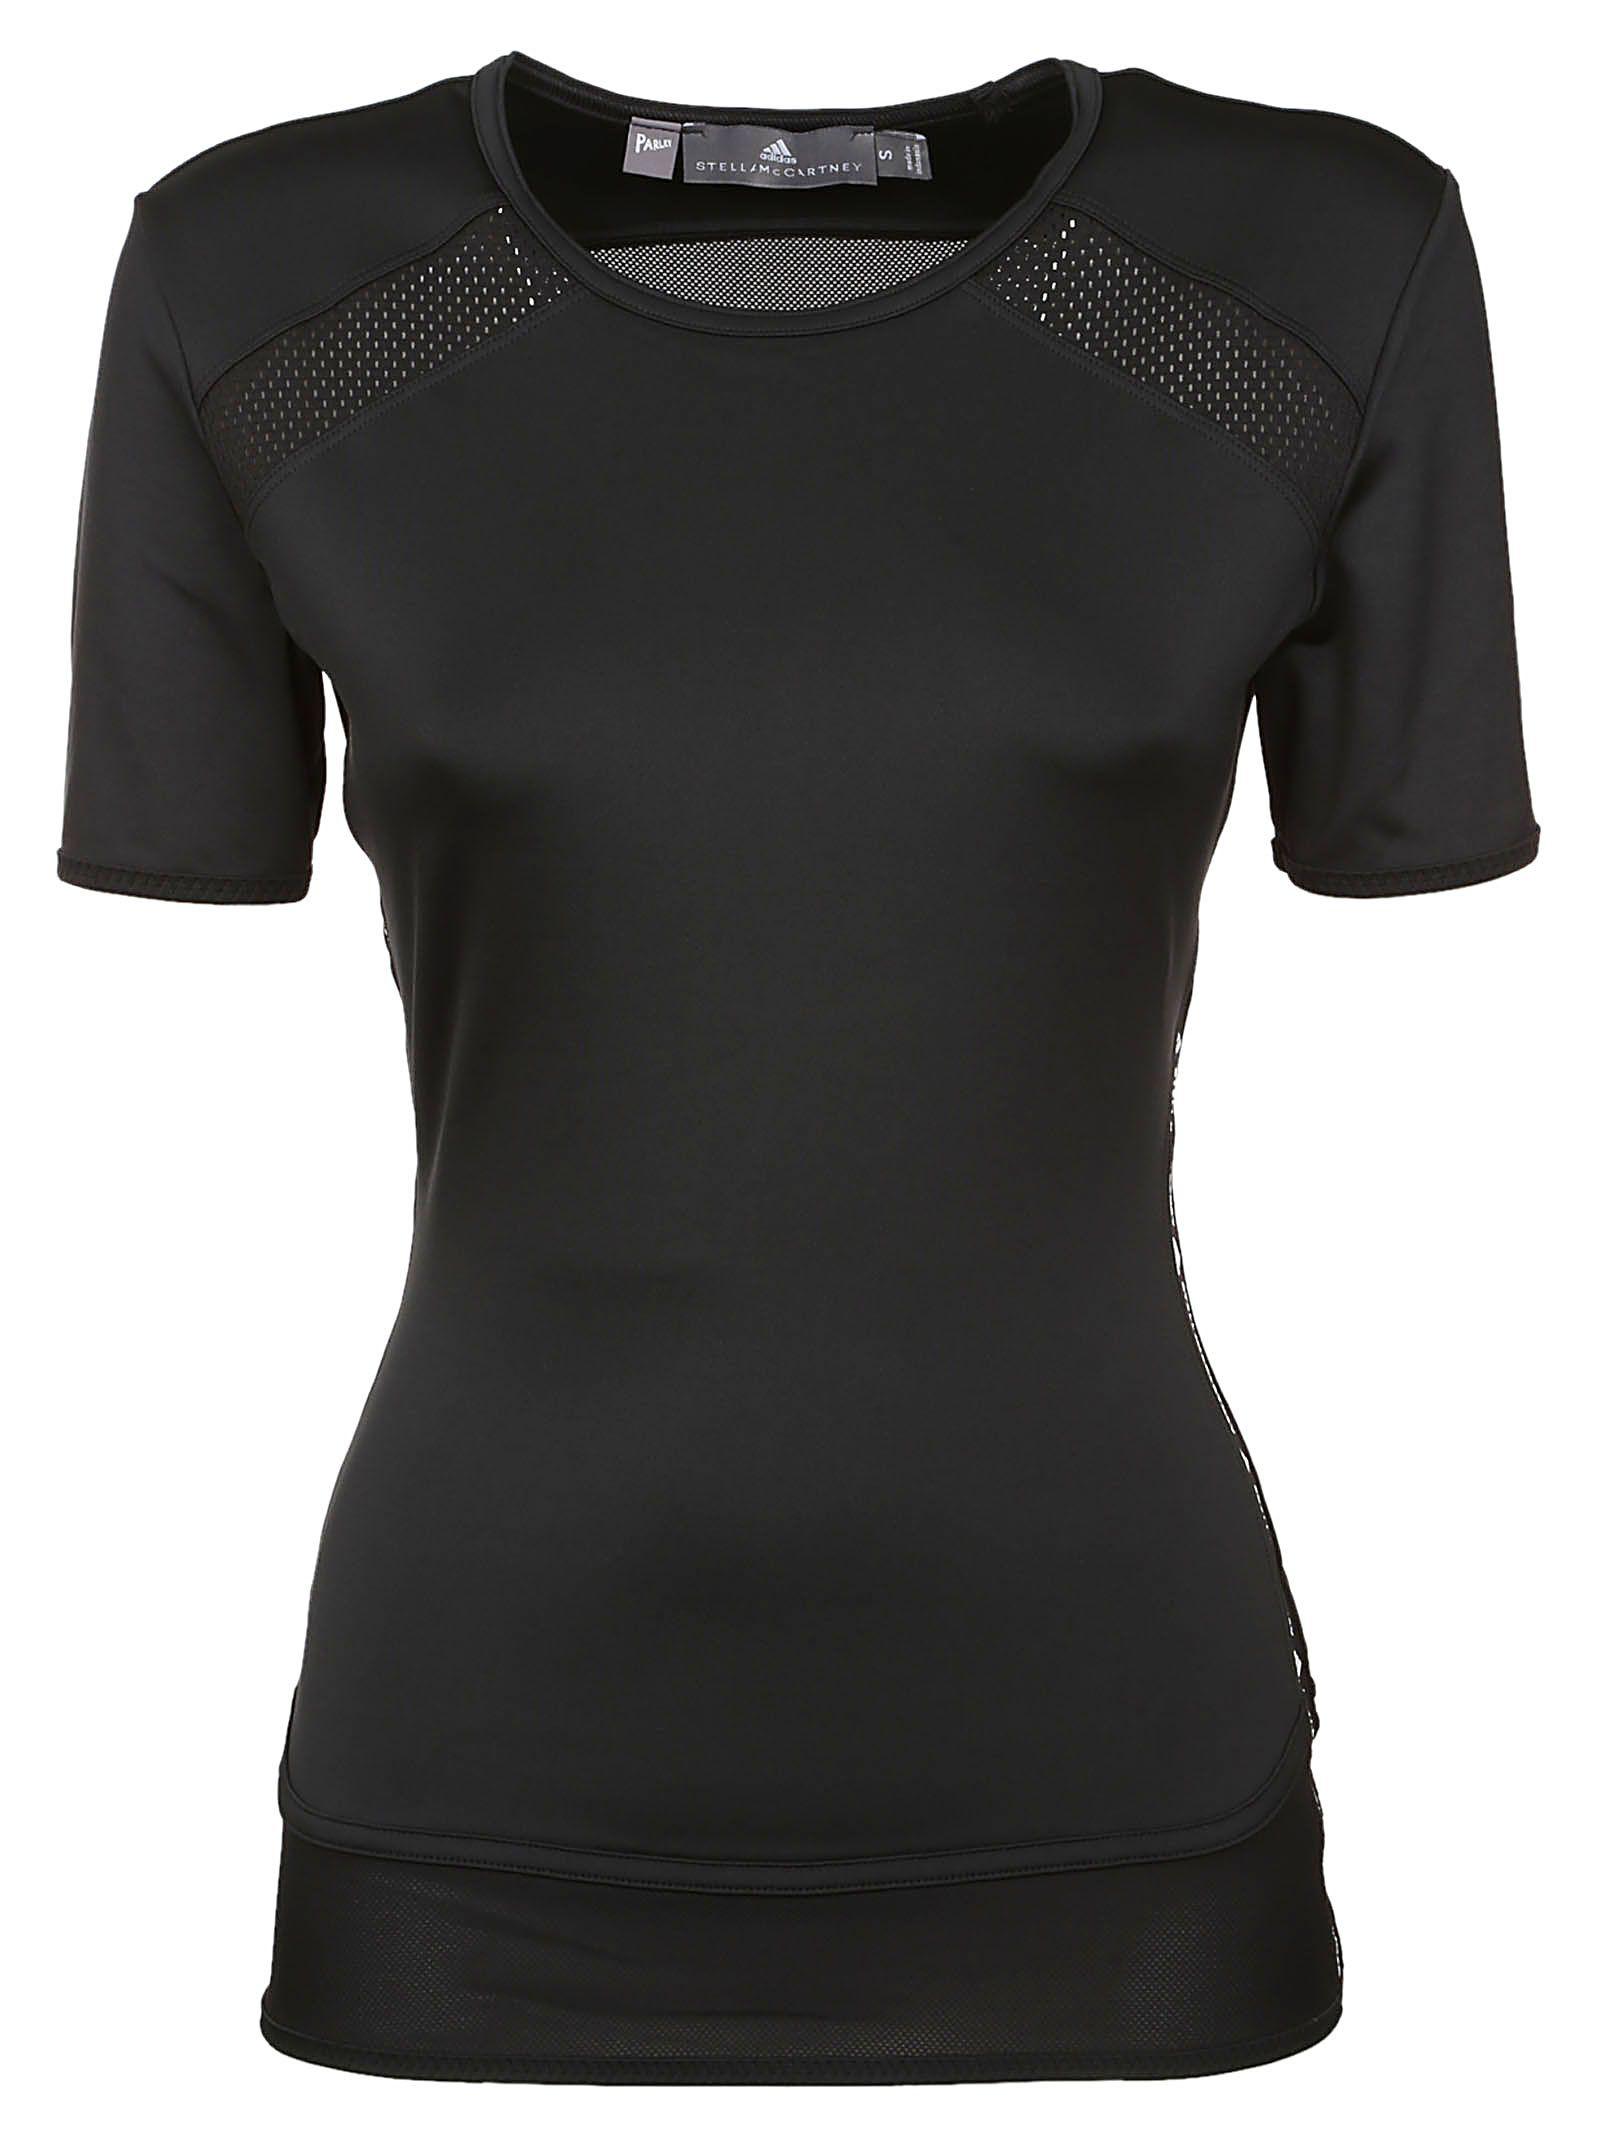 Adidas by Stella McCartney Recycled jersey training